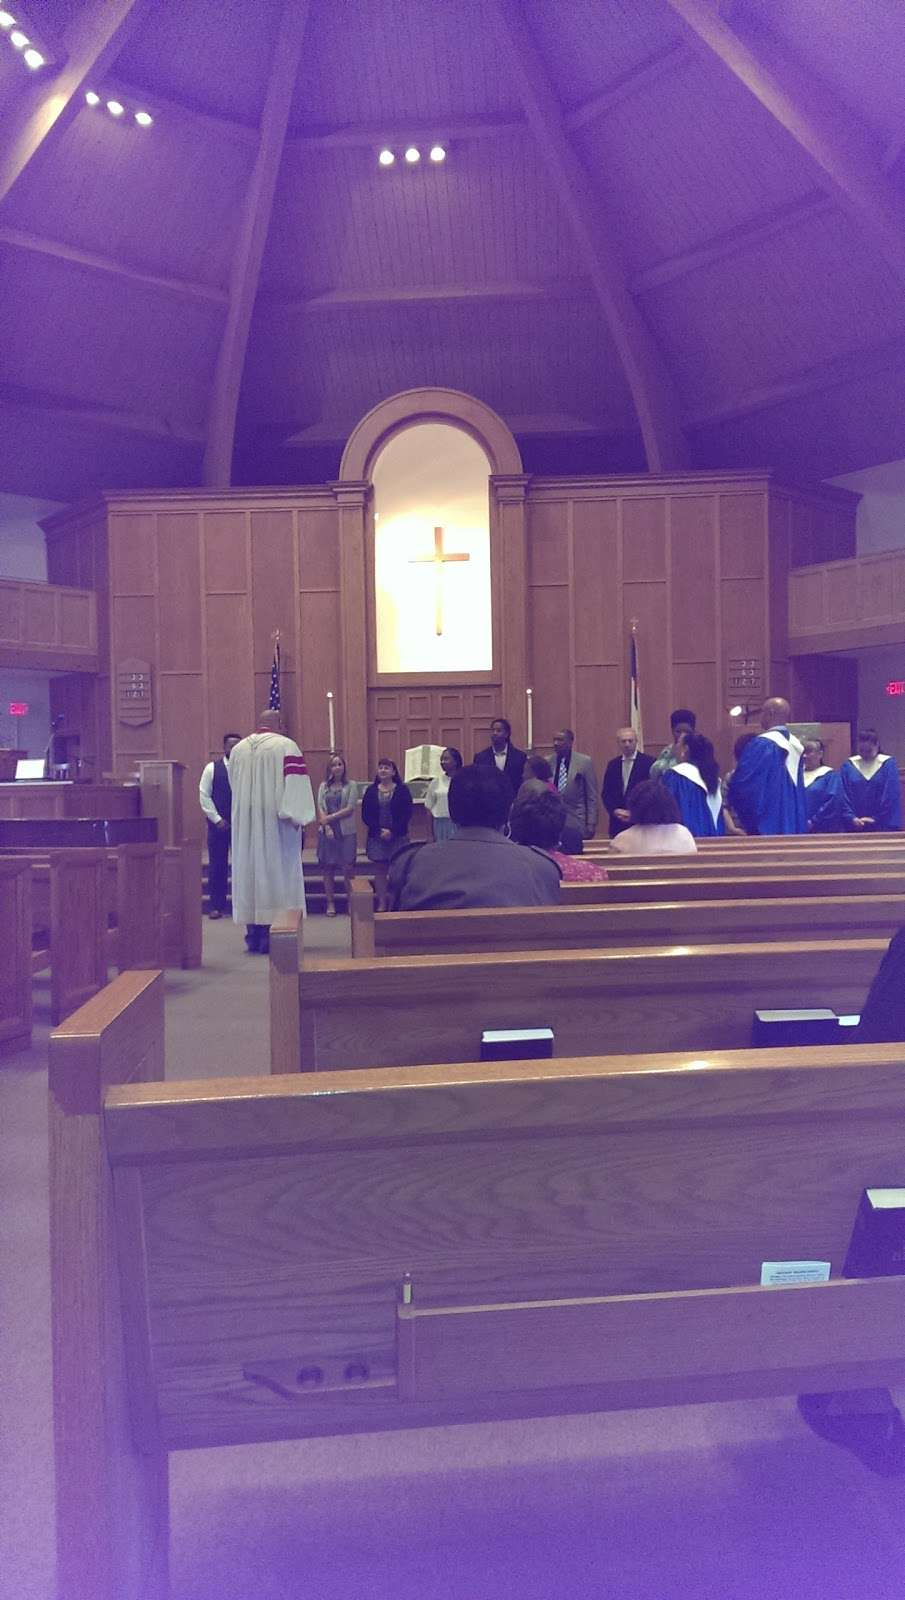 First Baptist Church - church  | Photo 1 of 3 | Address: 407 New Rochelle Rd, Bronxville, NY 10708, USA | Phone: (914) 793-2560